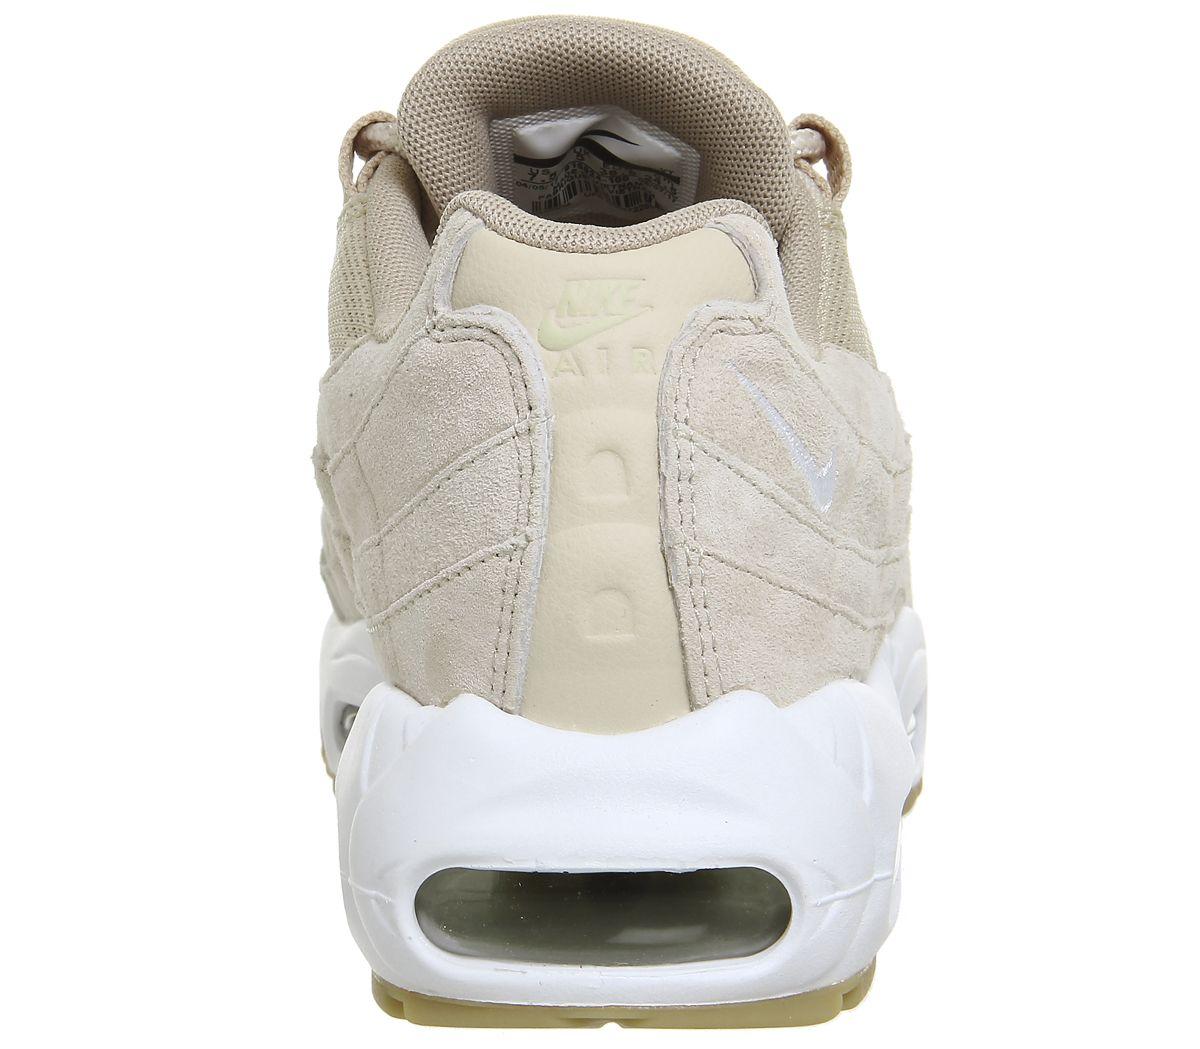 e6153293ba Nike Air Max 95 Oatmeal White - Unisex Sports